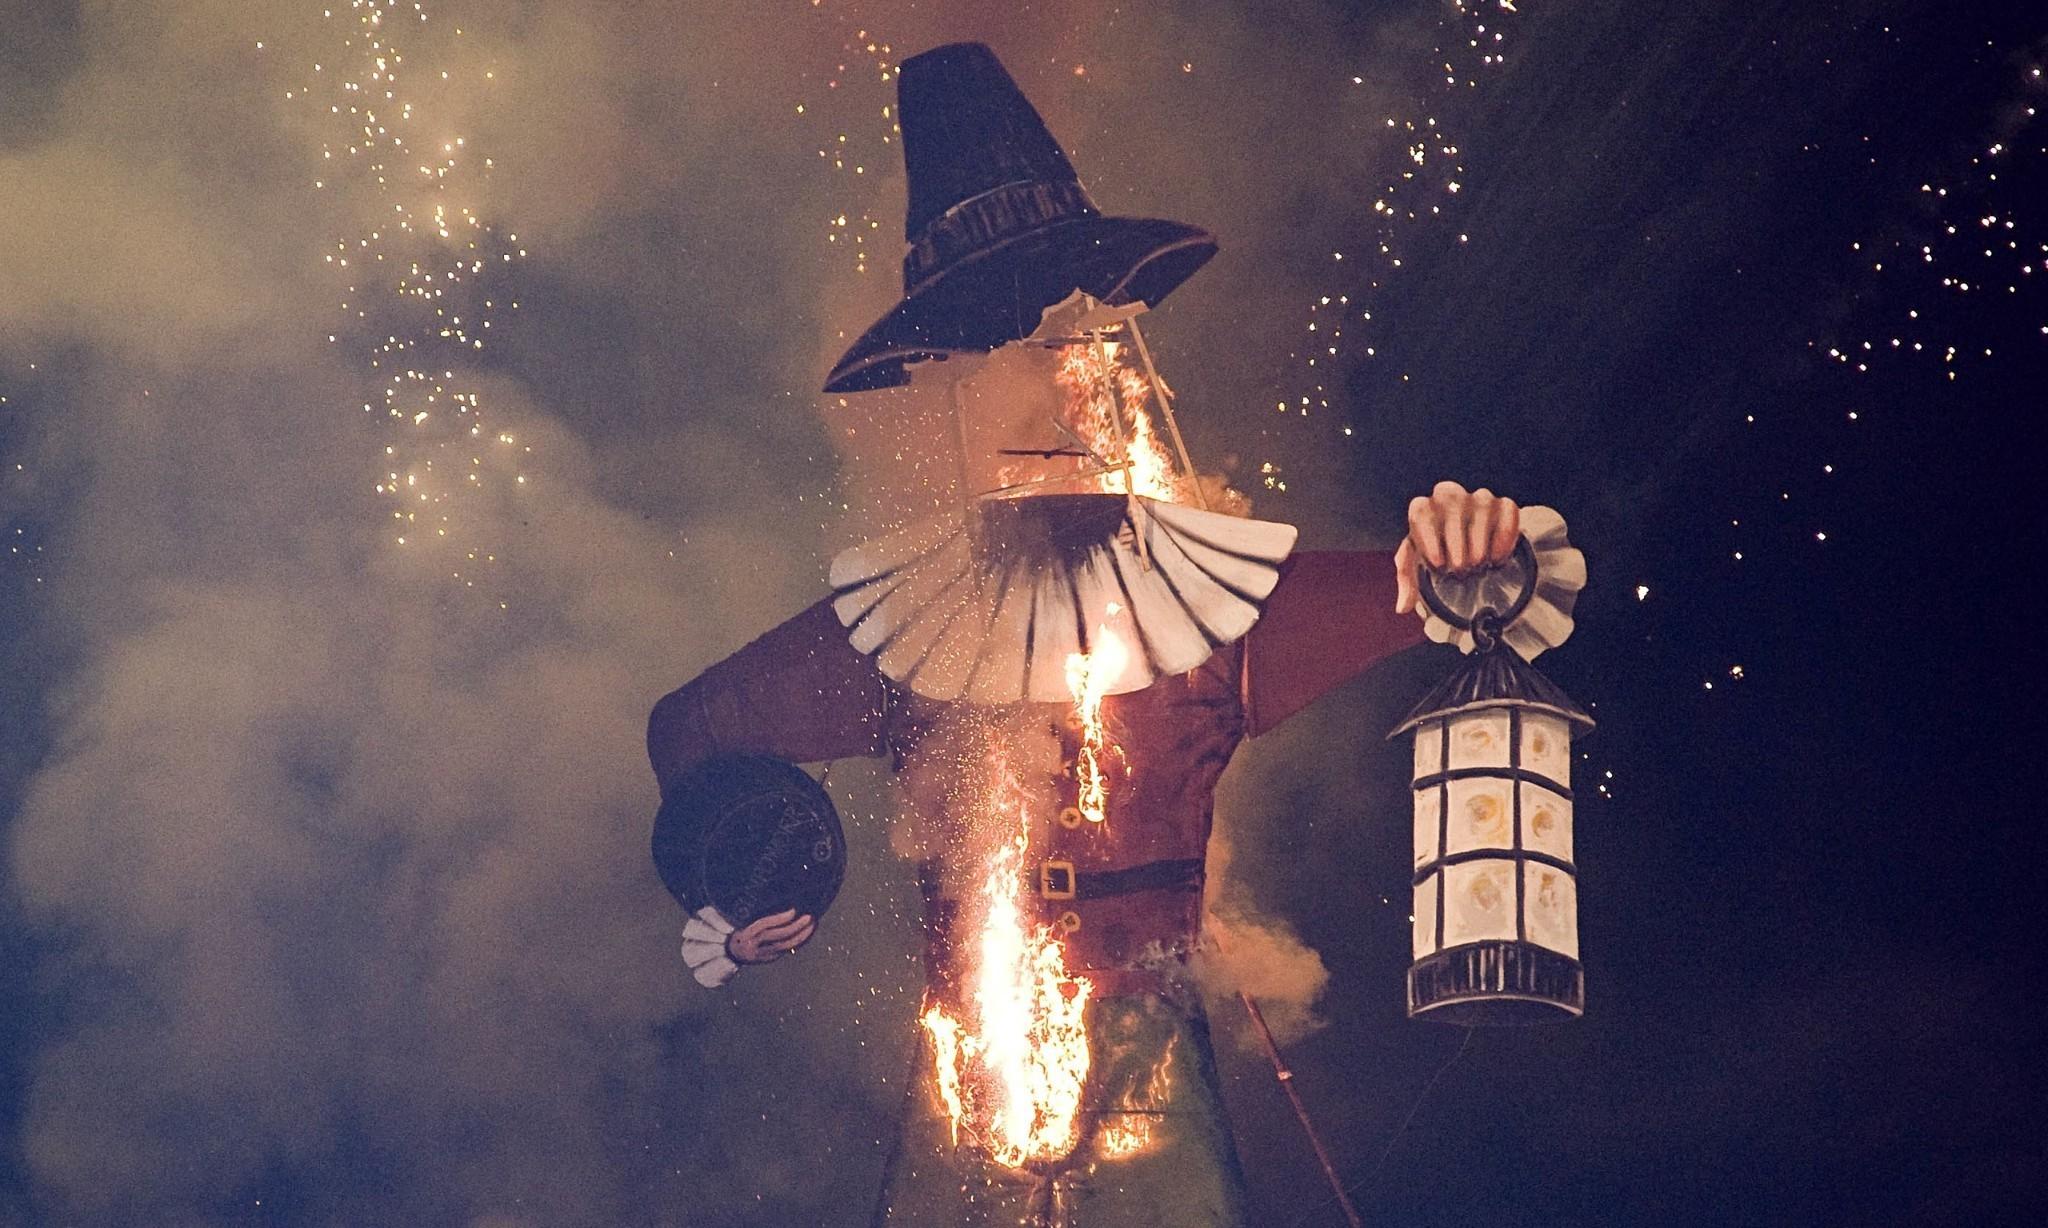 Gunpowder, treason and plot: literary conspiracy theories for bonfire night